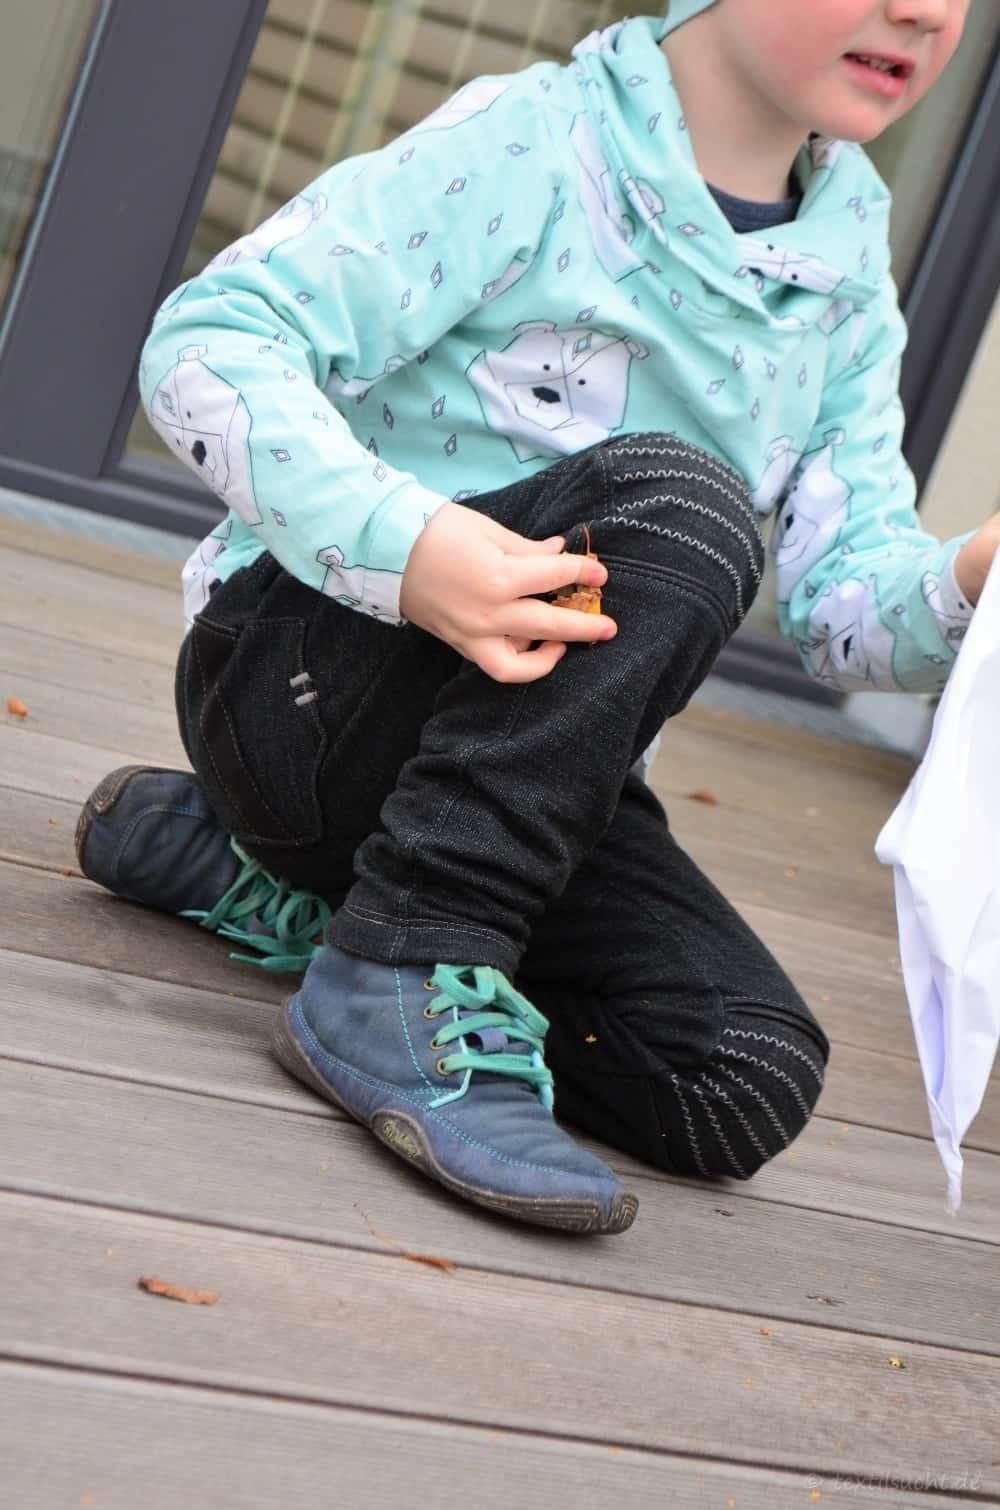 Schnittmuster Kinderhose Steppo aus Wollsweat - Bild 3 | textilsucht.de